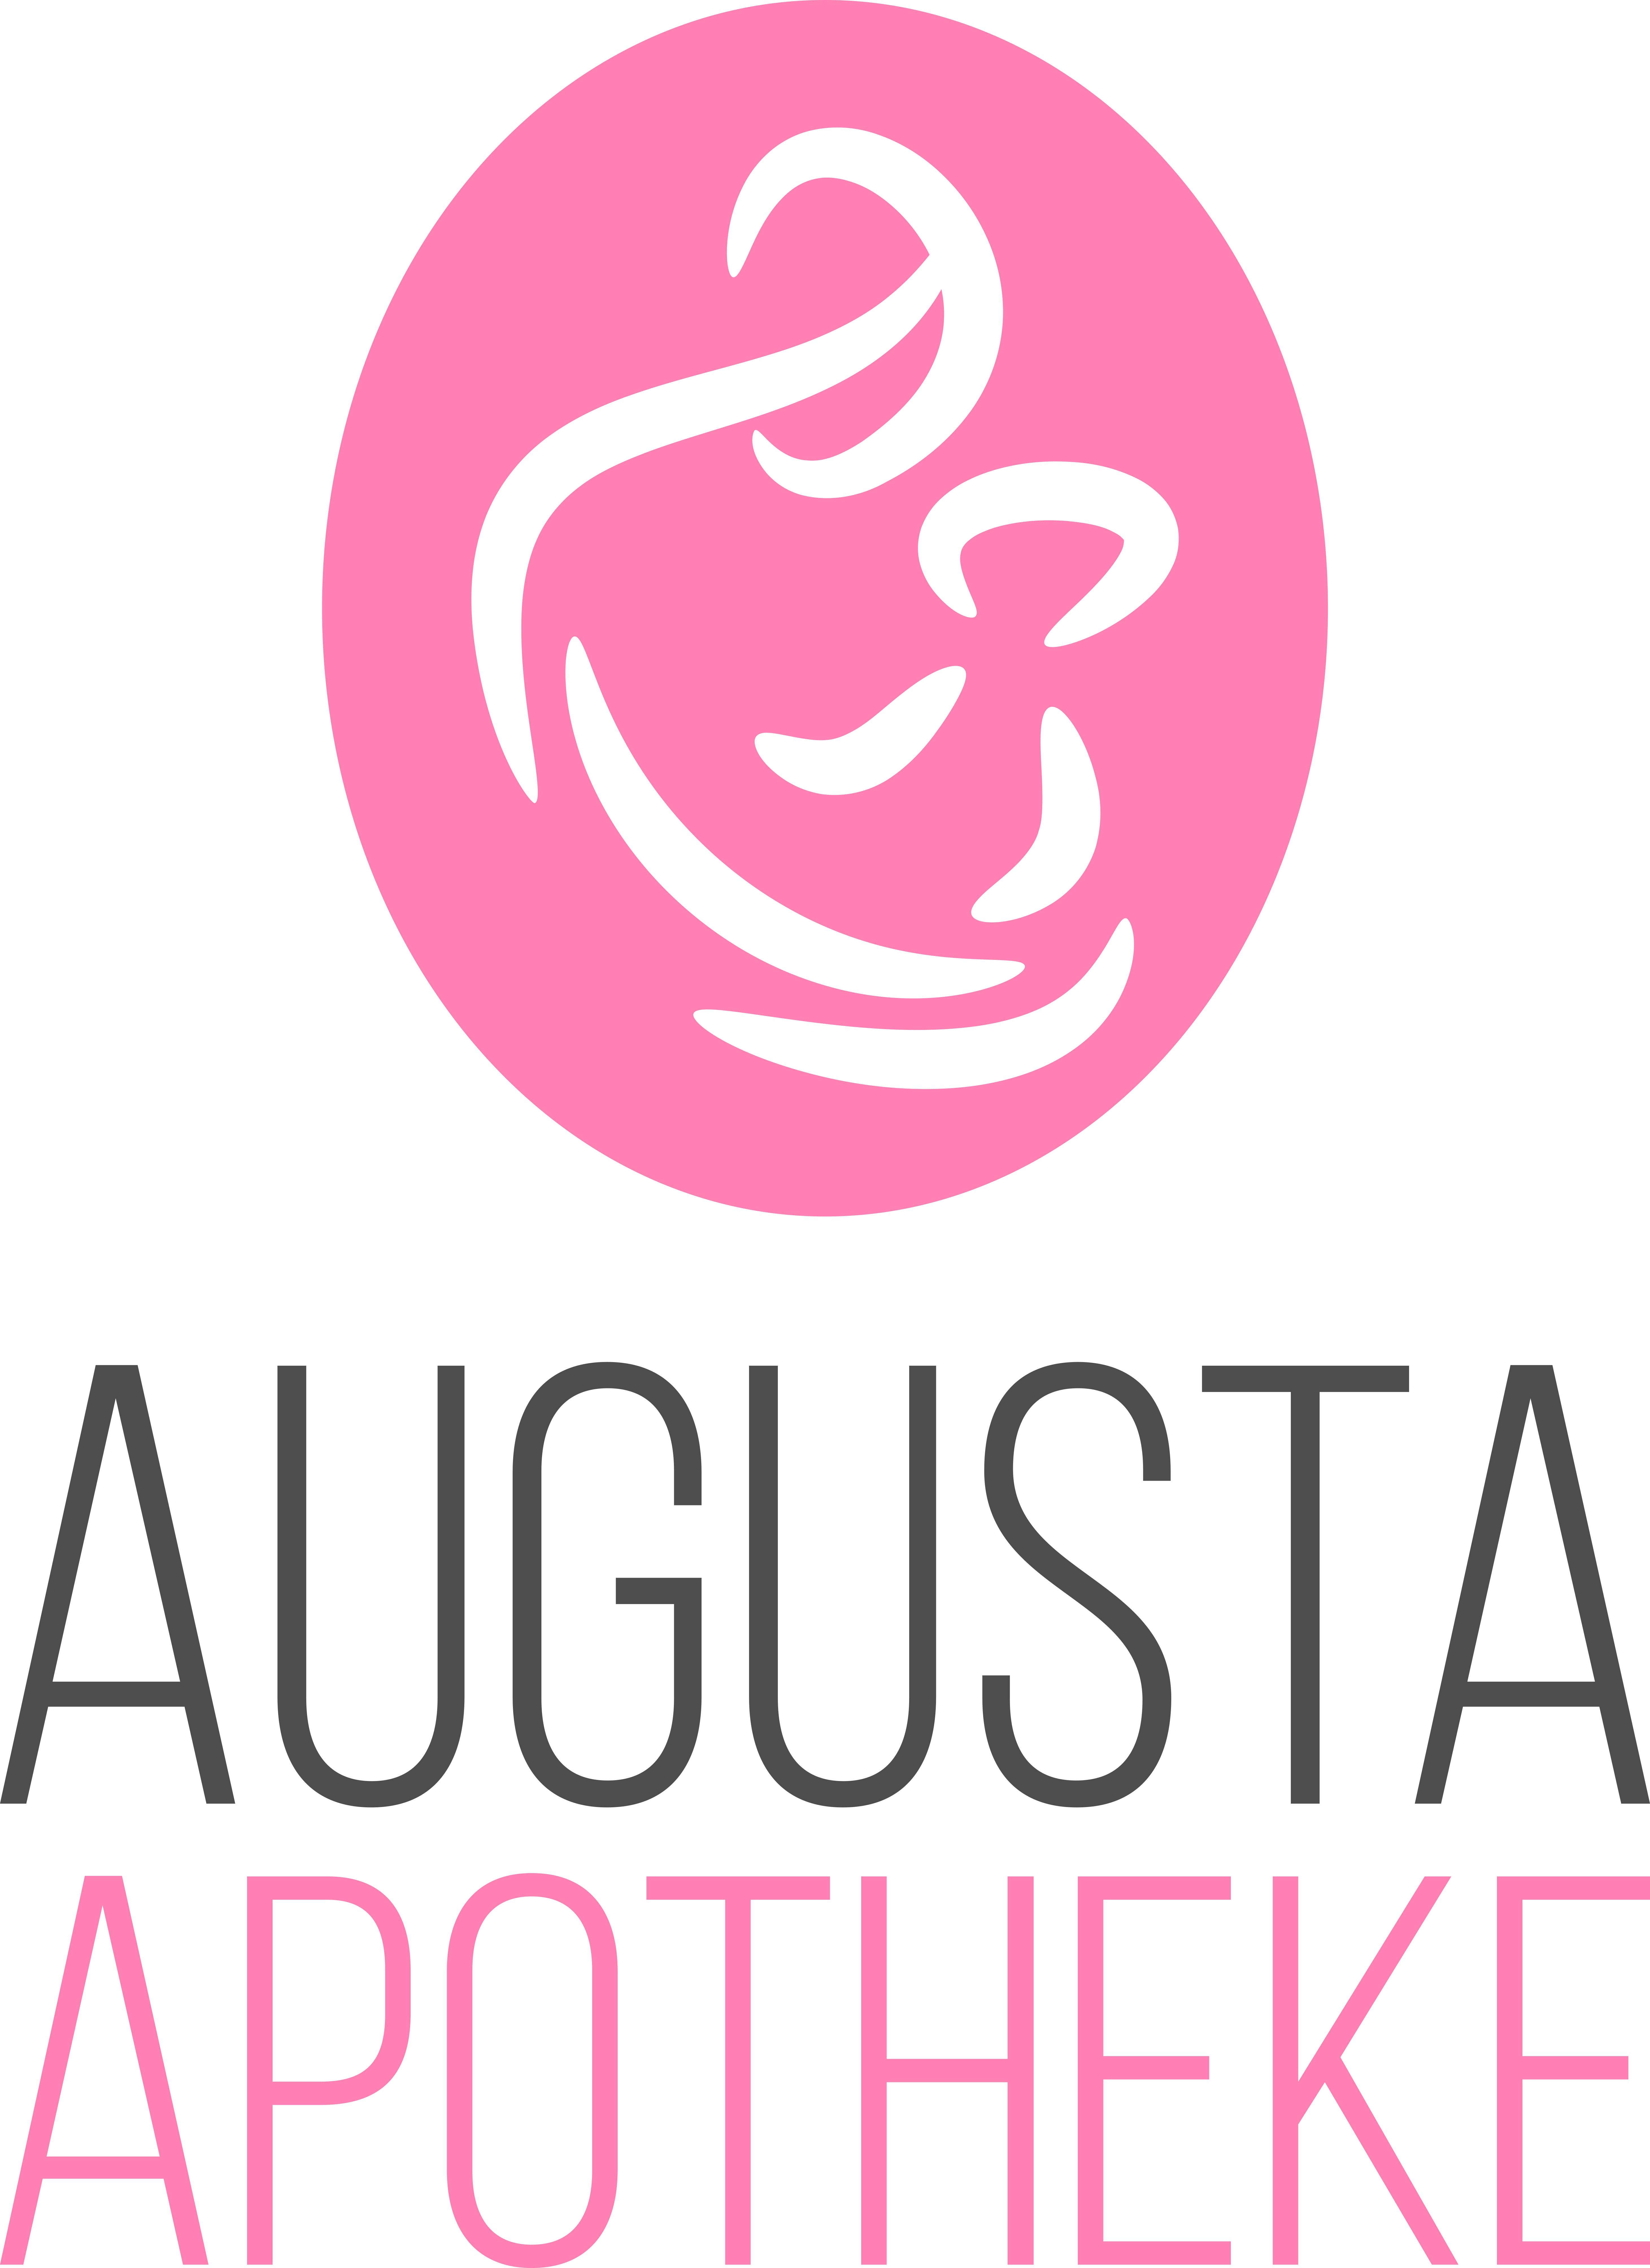 Augusta Apotheke Hattingen